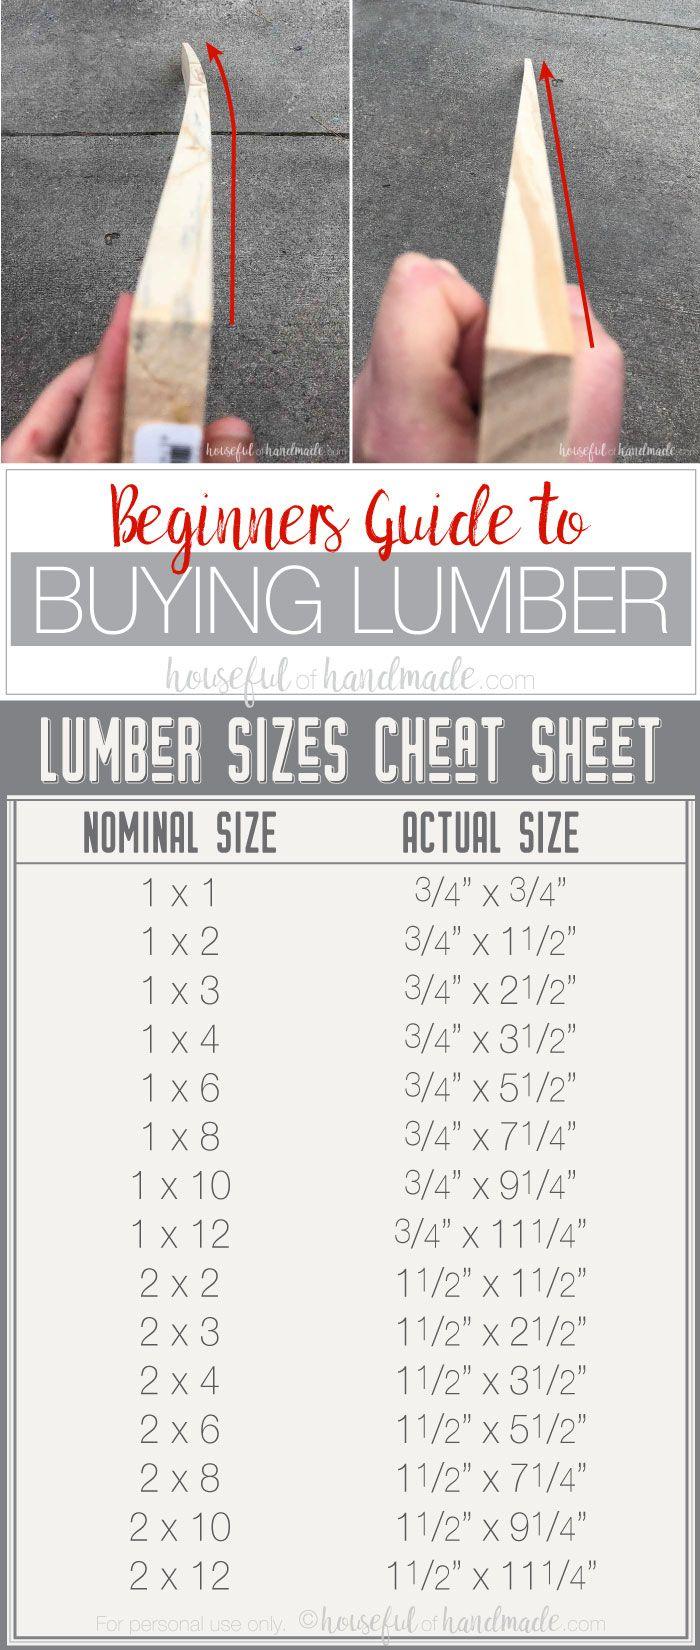 Beginners Guide to Buying Lumber